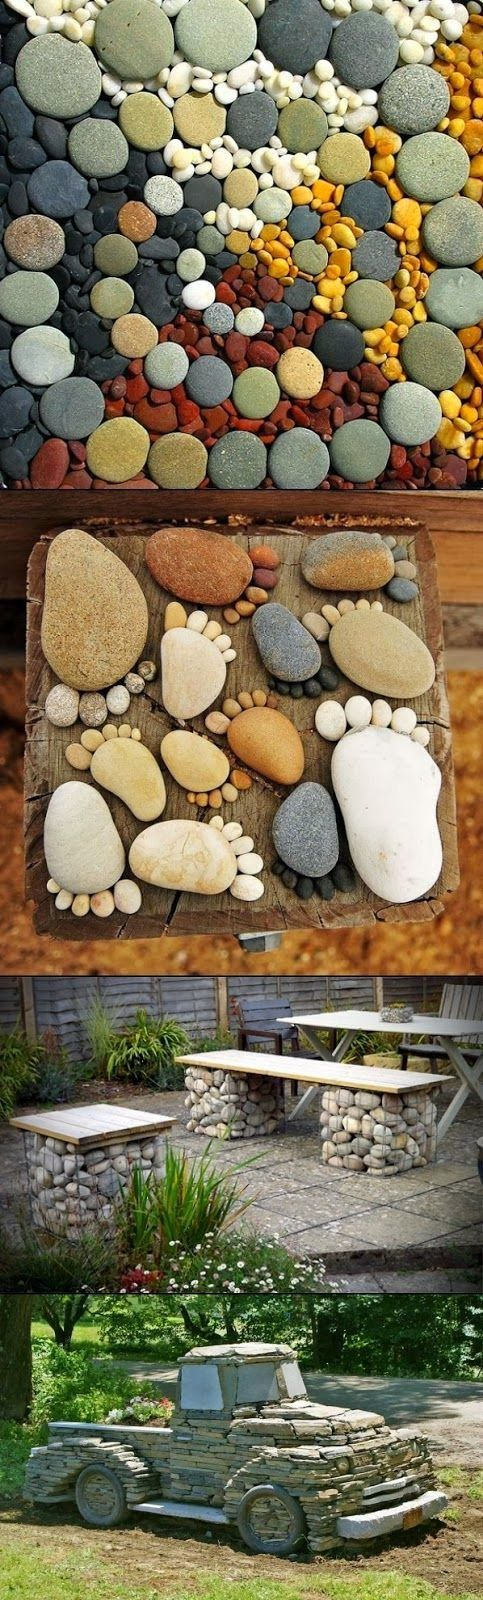 Pinned onto DIY Garden Board in DIY Garden and Yard Category